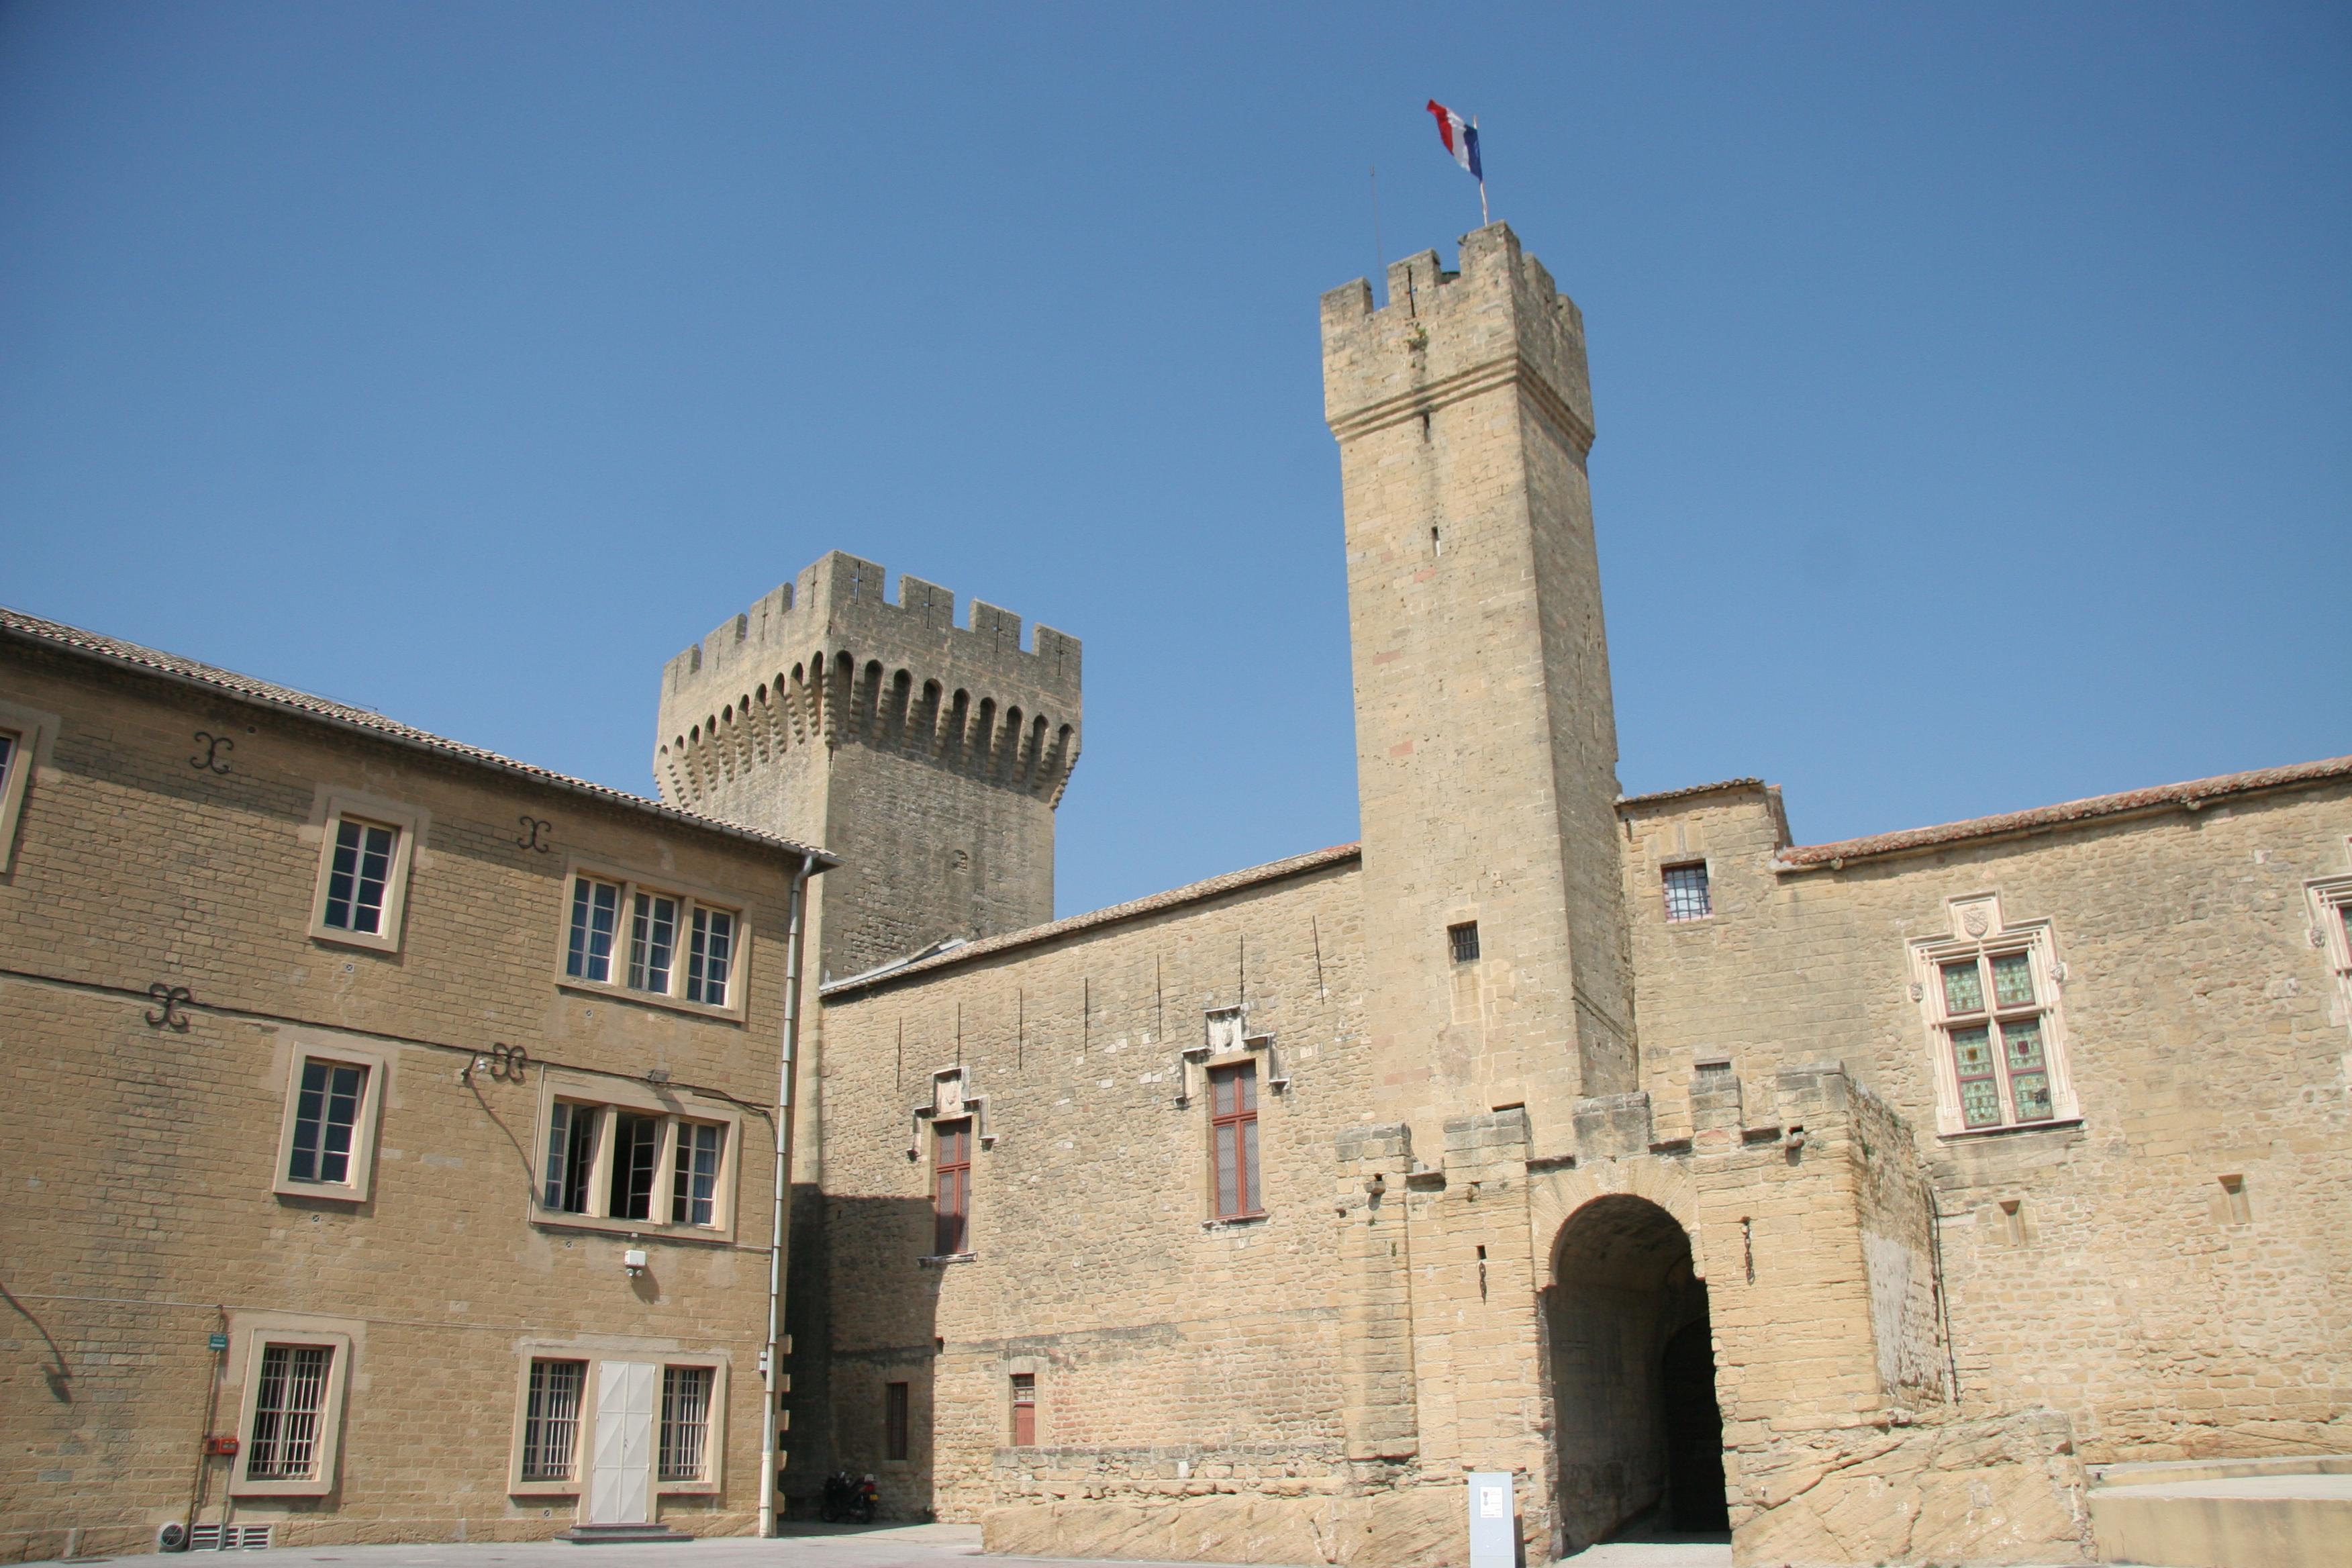 Salon de provence wiki everipedia for Salon de provence